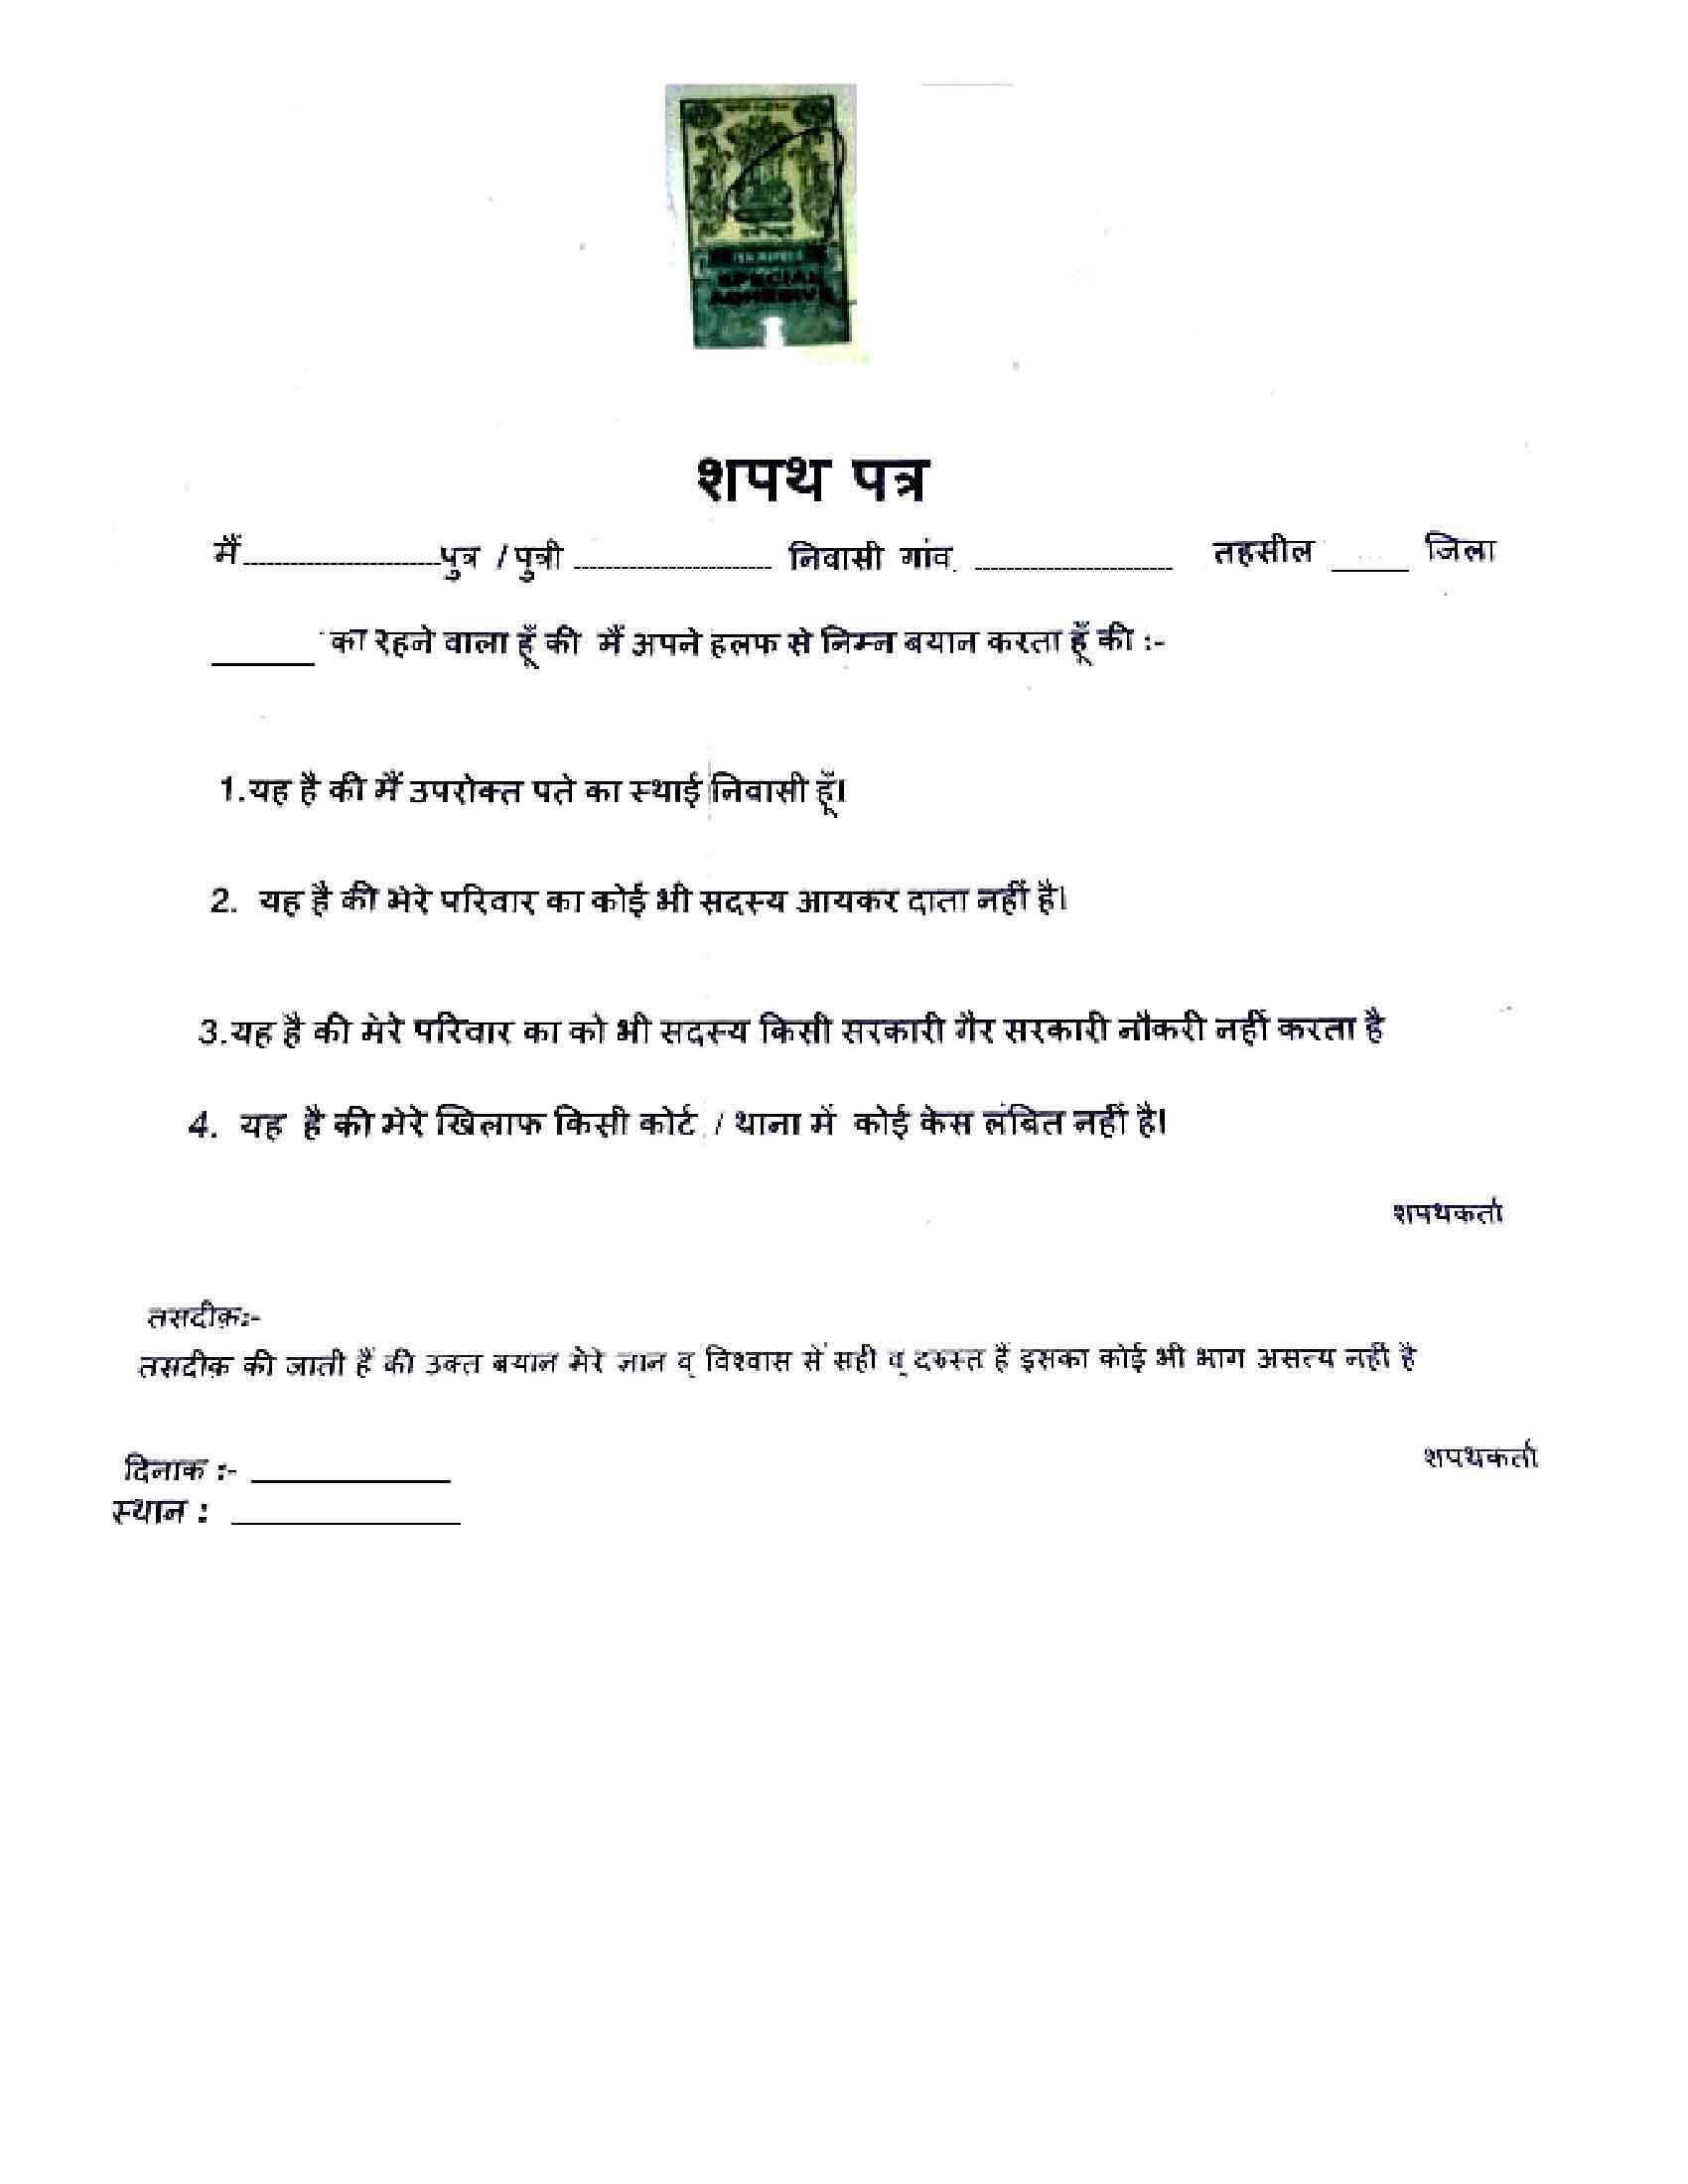 8598ed5415649425ff4b97b3e19f5154 Online Form Govt Job Haryana on